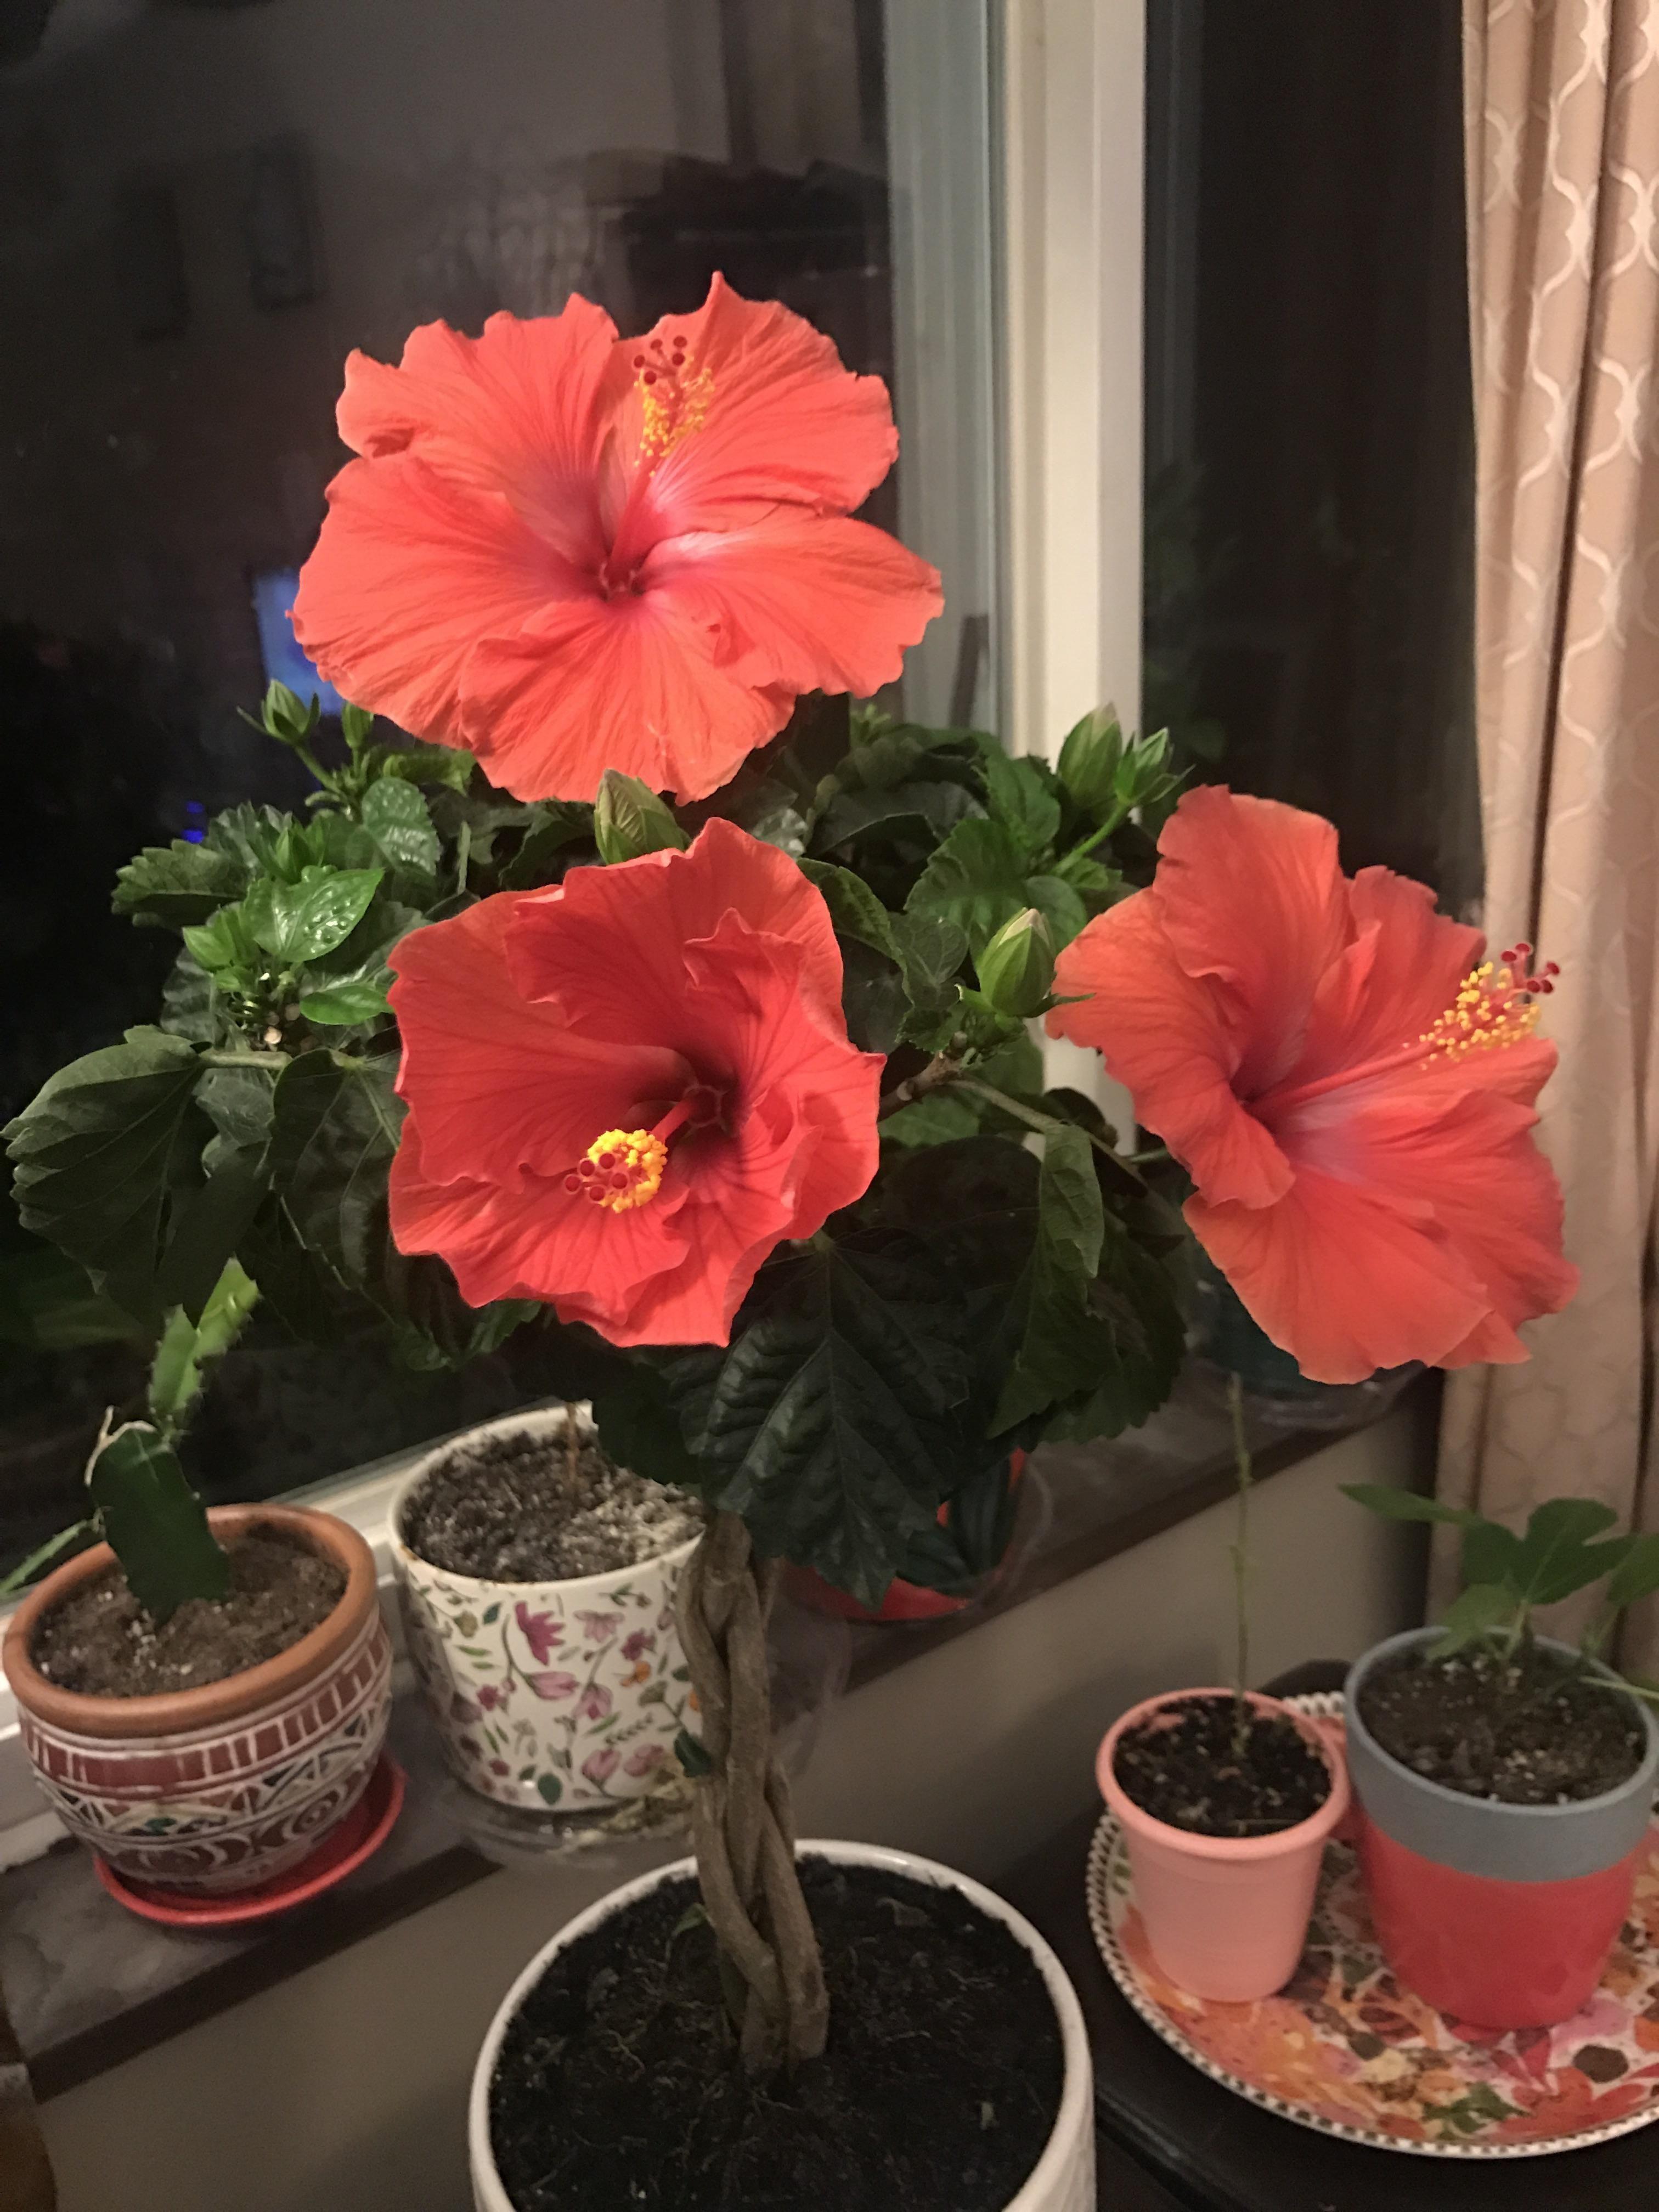 Got Three Hibiscus Blooms Today Gardening Garden Diy Home